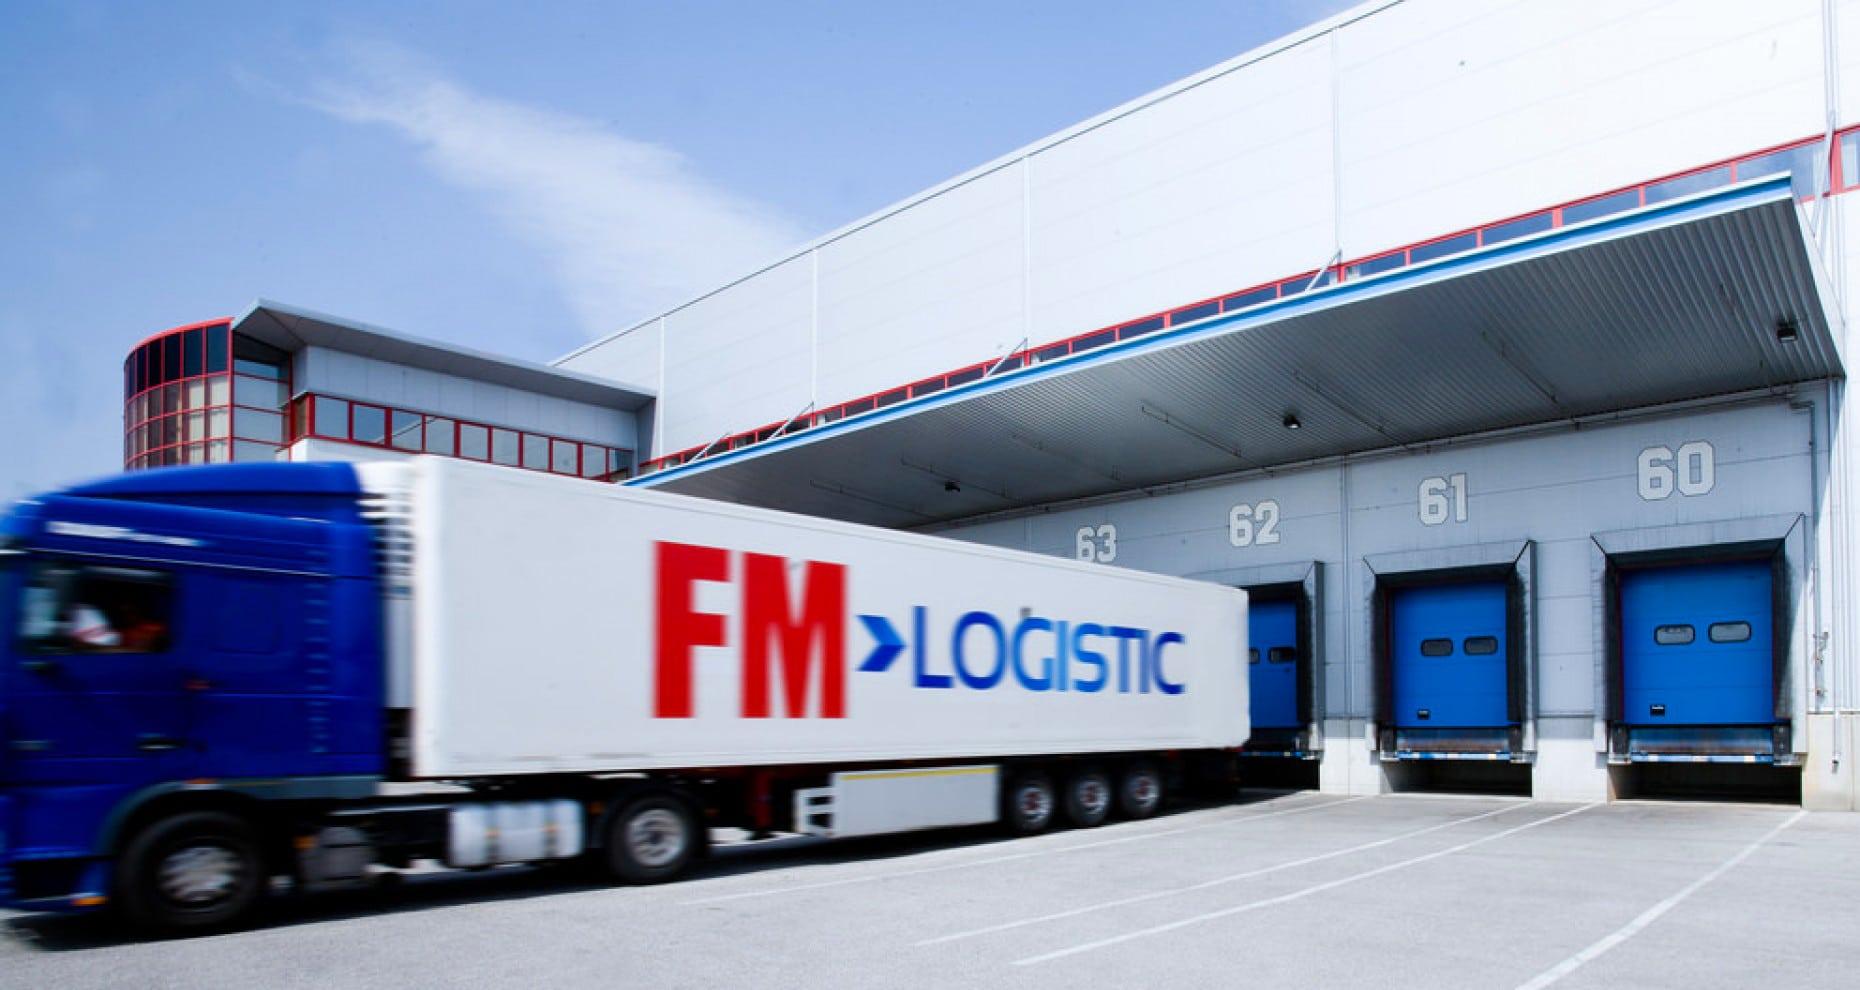 fmlogistic-depozitare-logistica-transport